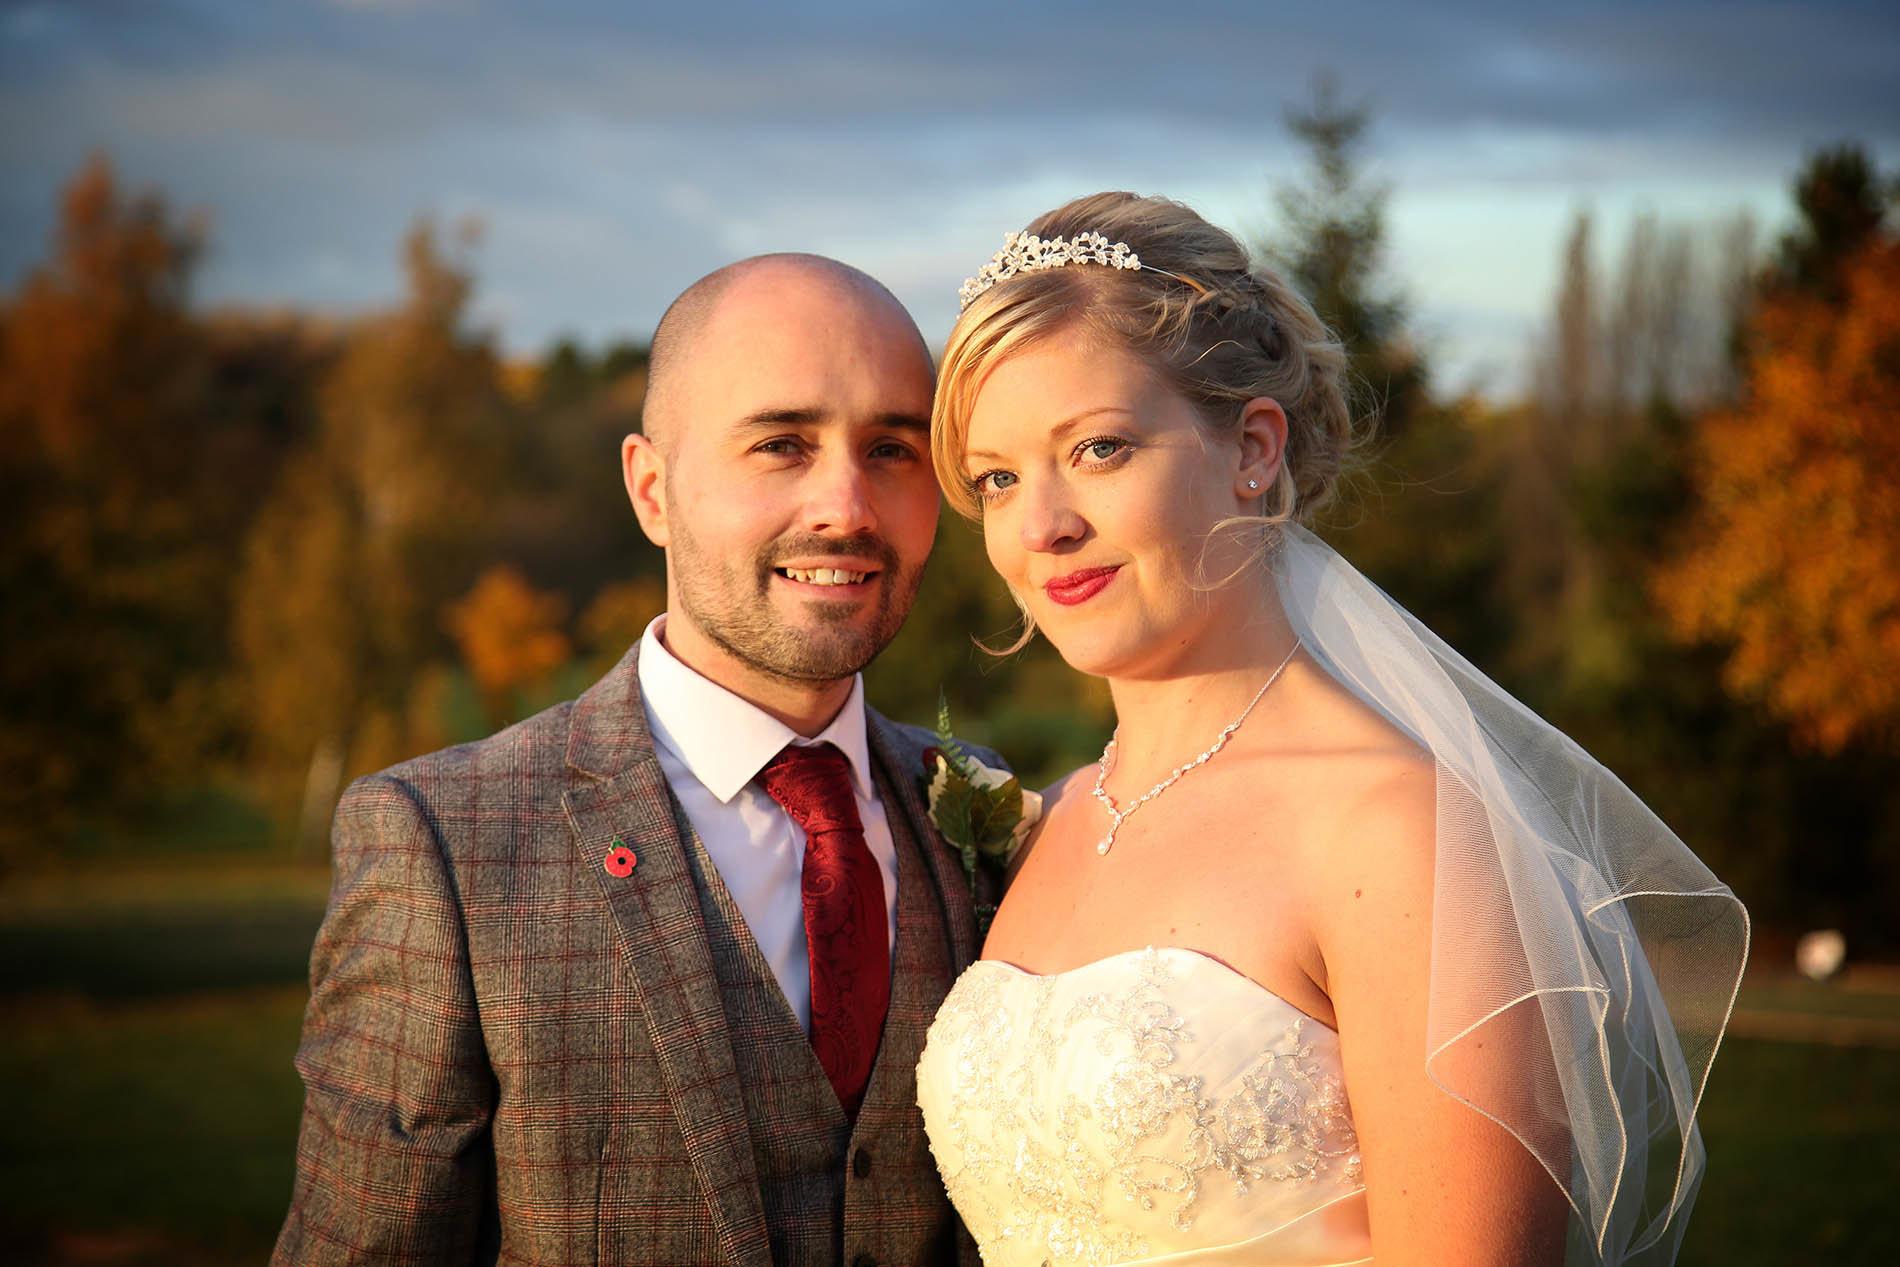 Northants Wedding Photography by Karl Drage